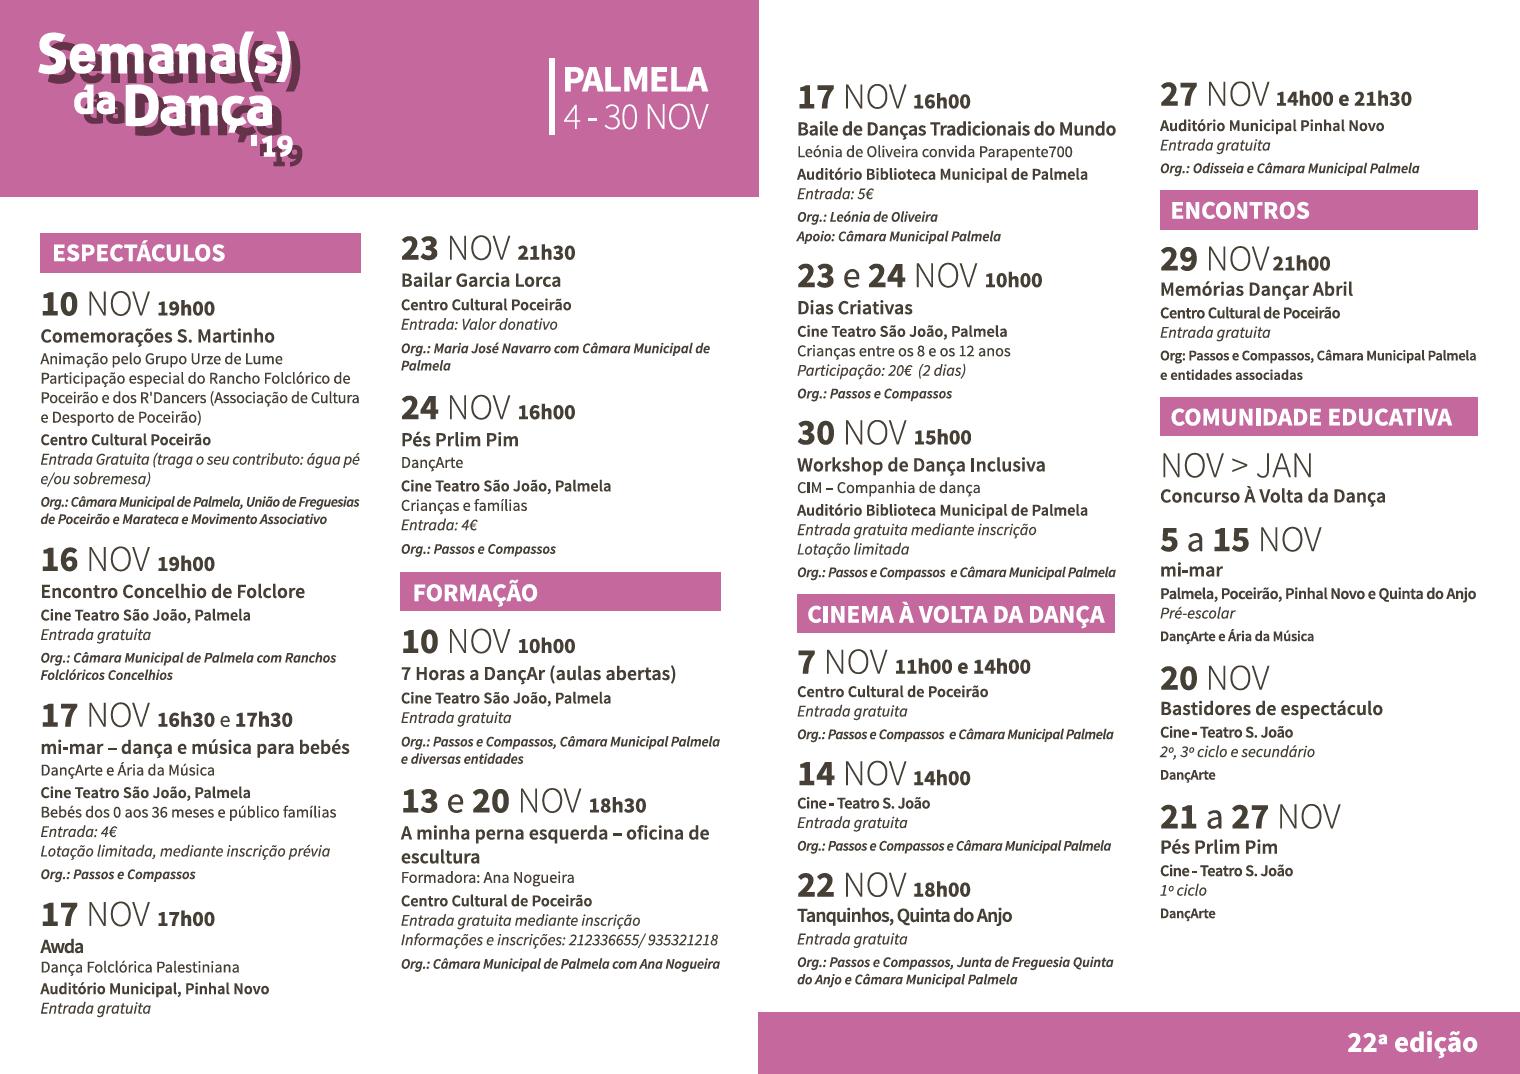 Programa -Semana da Danca 2019 - Palmela